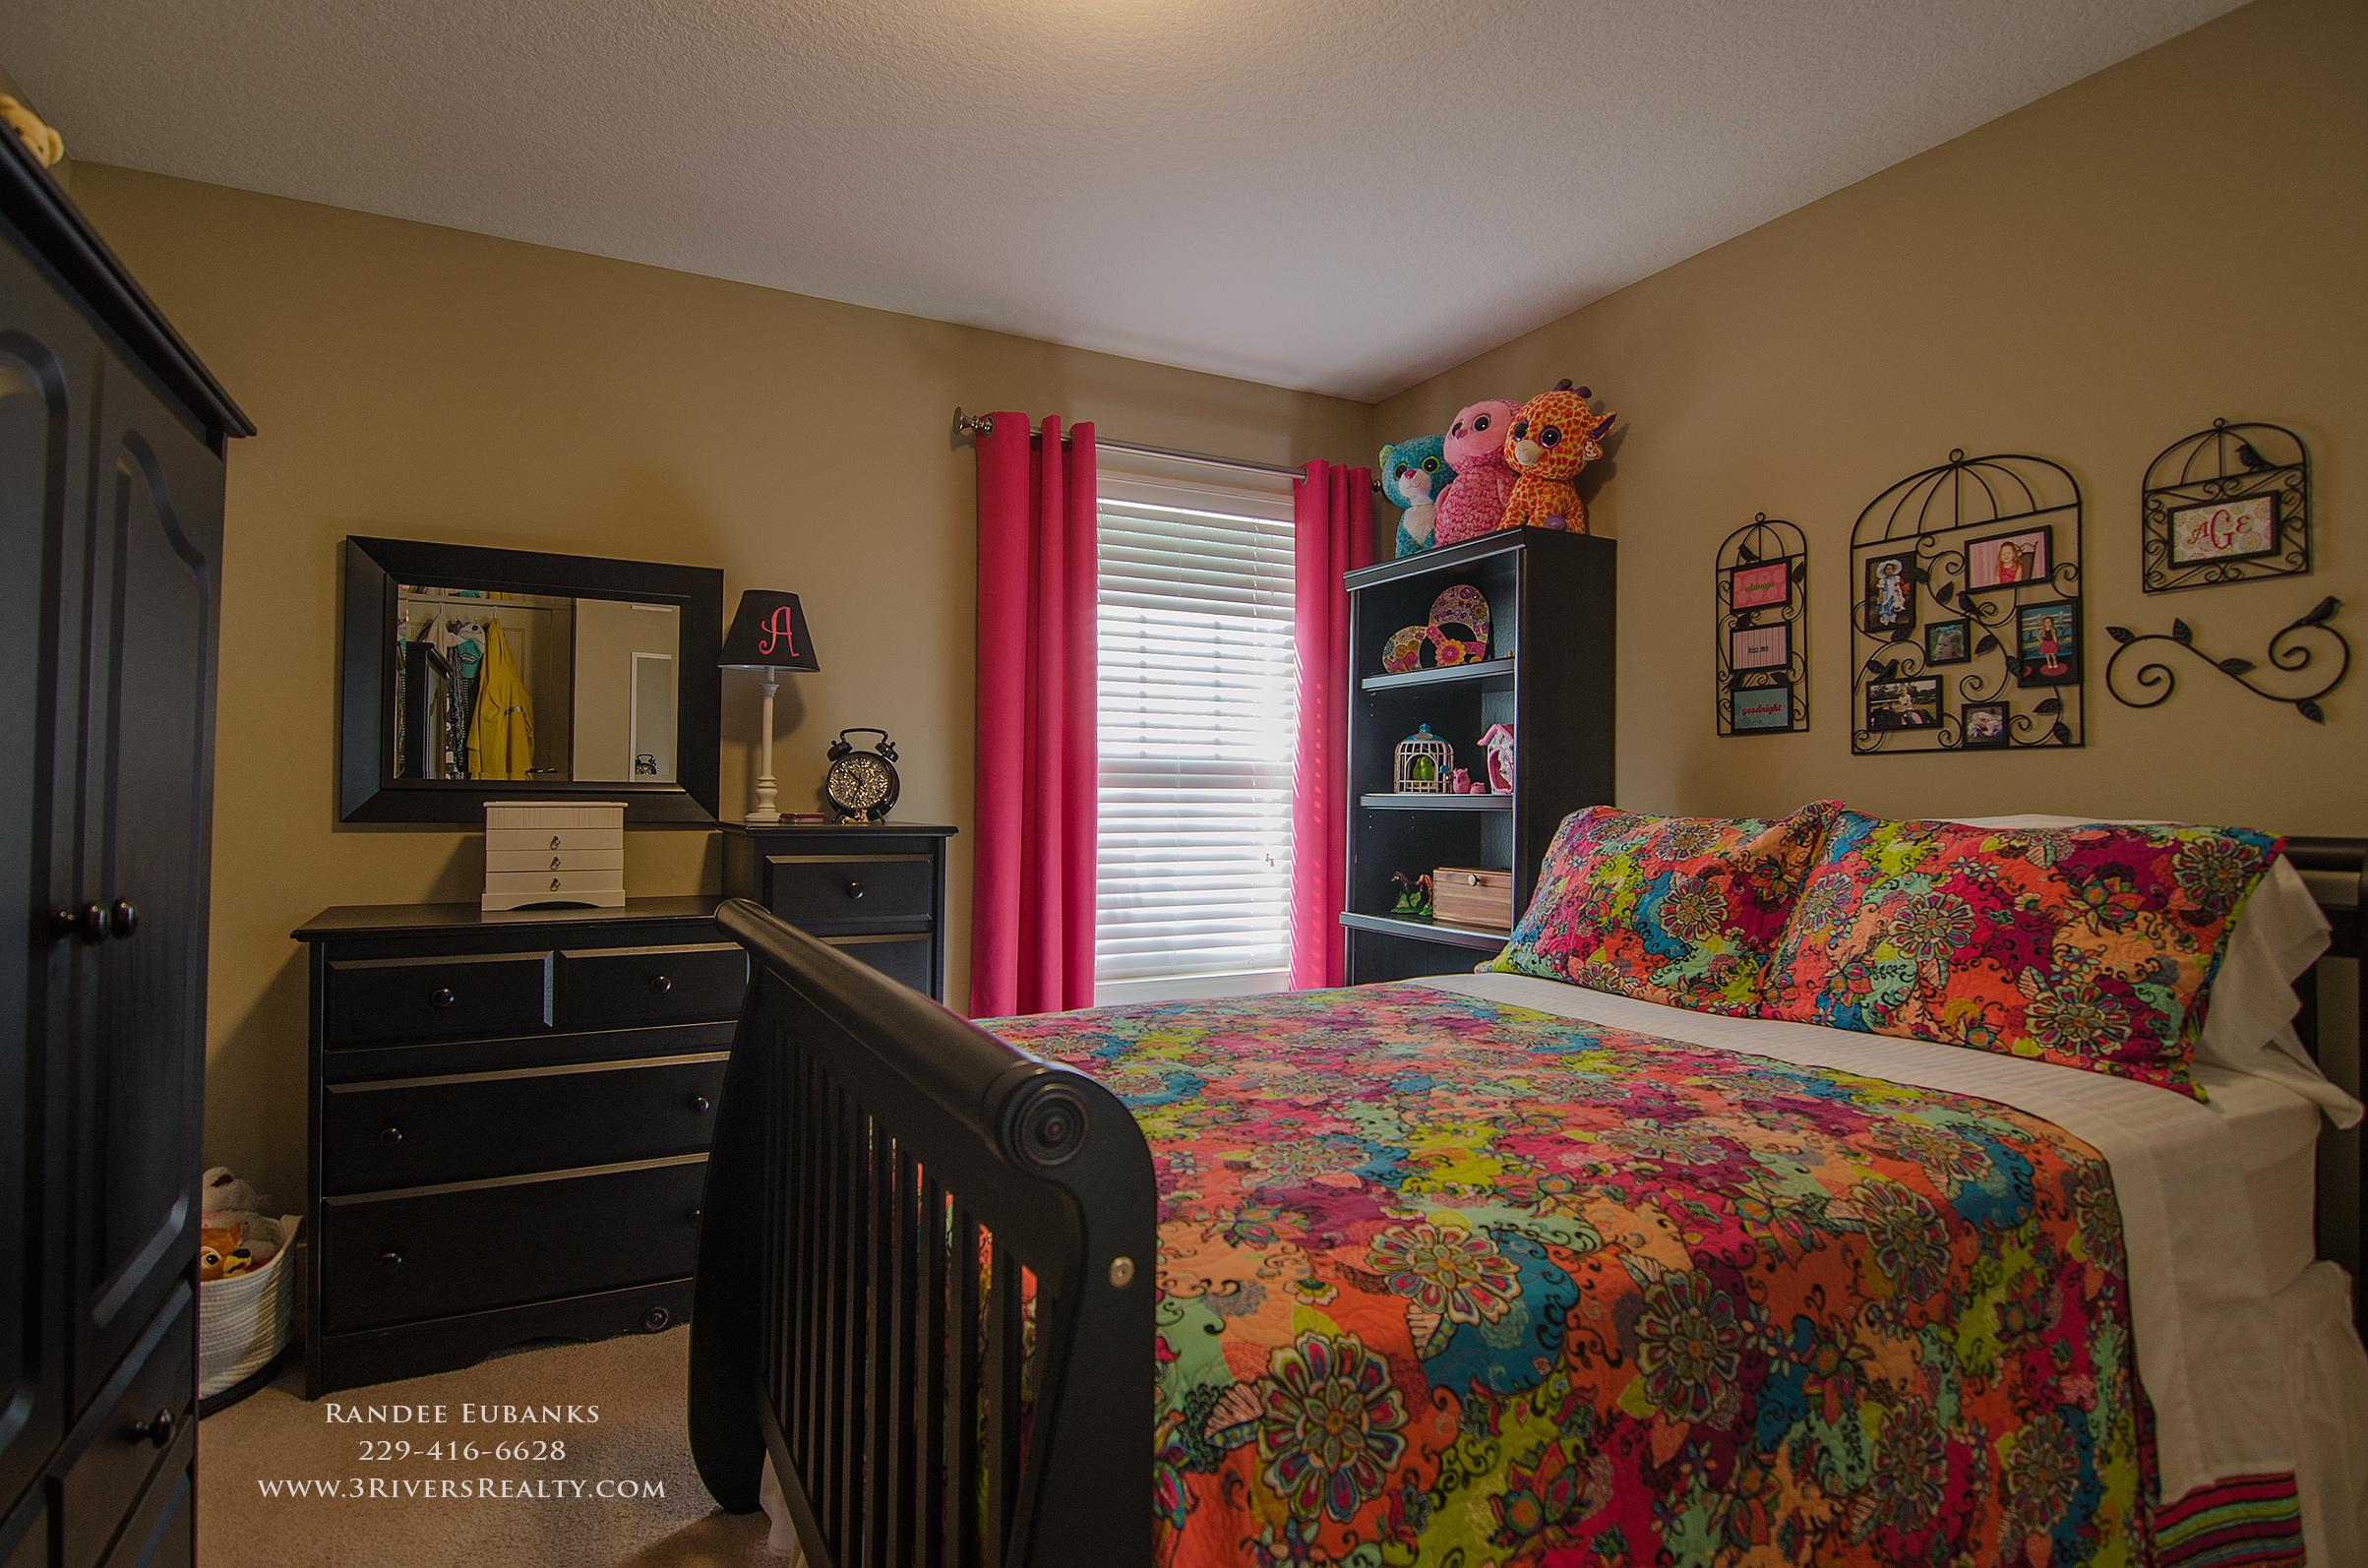 3riversrealty_bainbridge-georgia-home-for-sale_3-bed-2-bath_outdoor-fireplace_three-rivers-realty_mills-brock_Taurus-USA_-pool_back-porch-bedroom2 - Copy.jpg